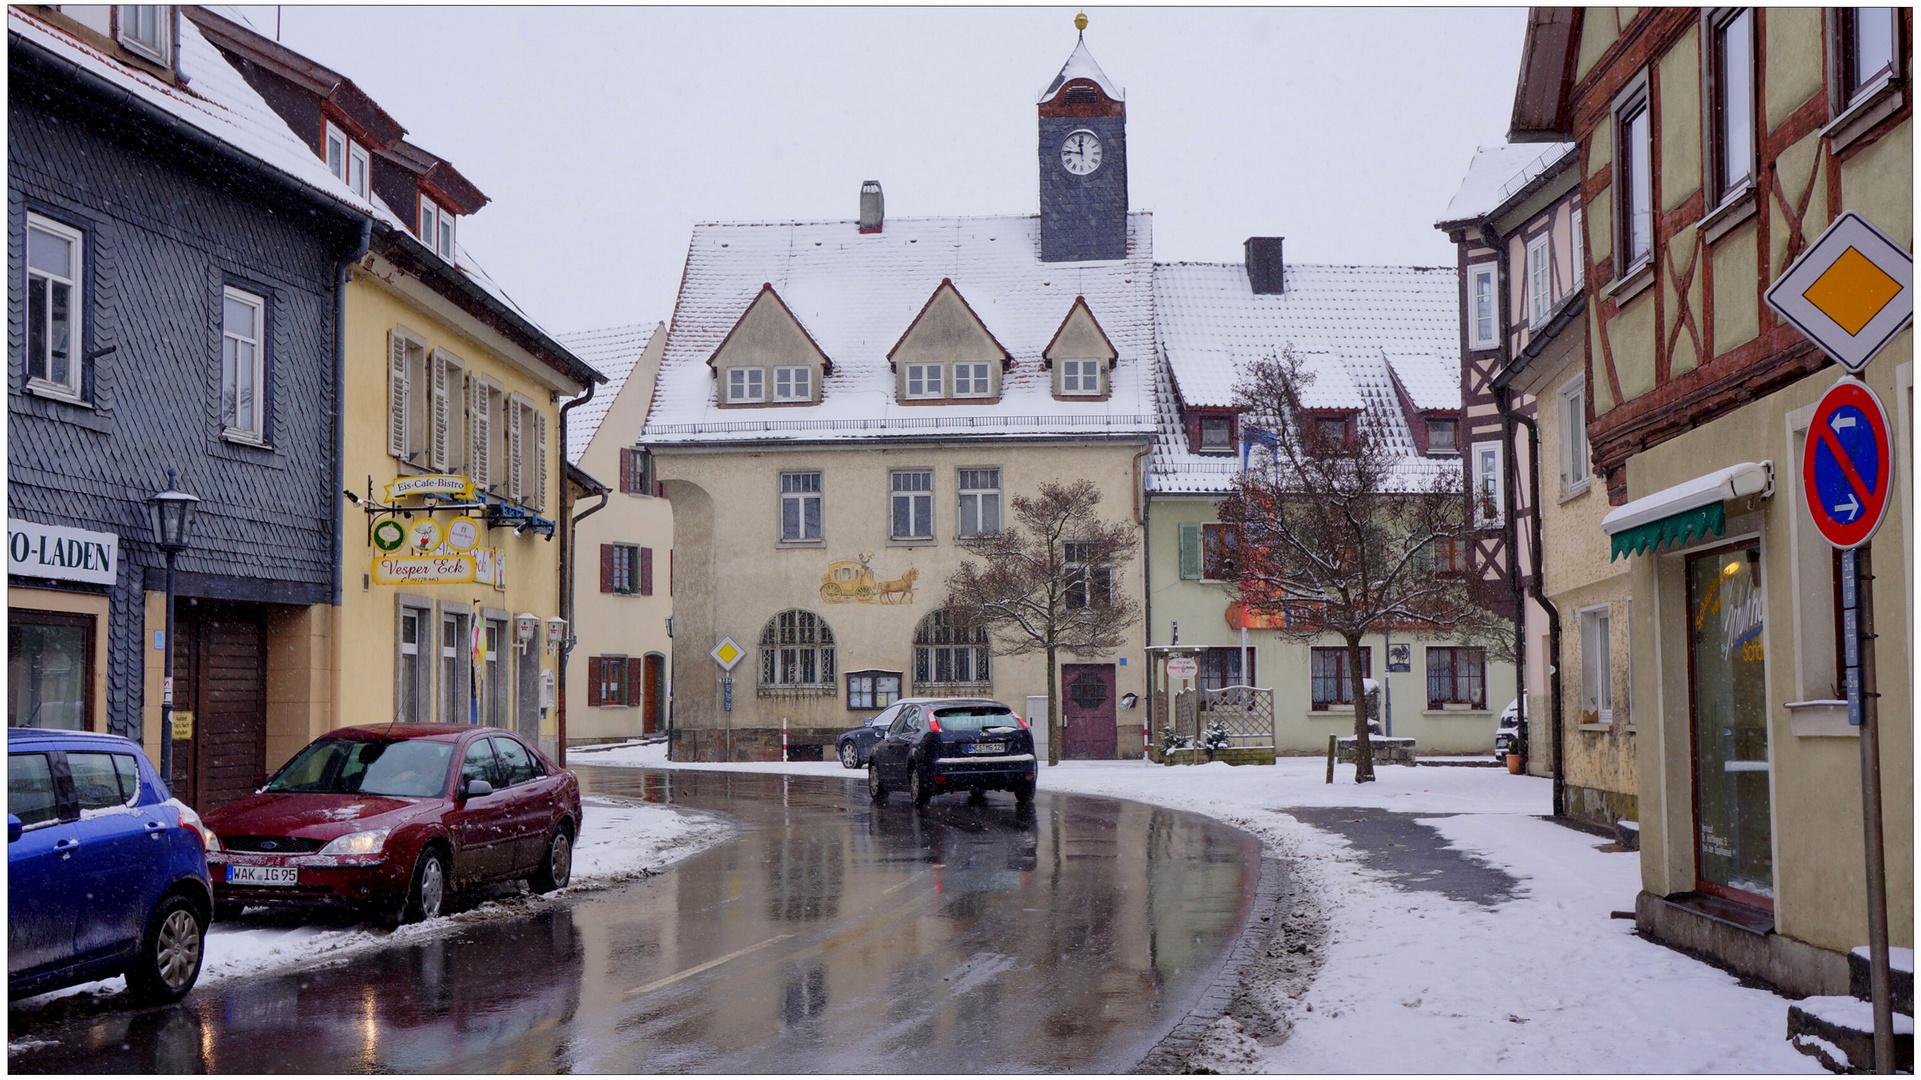 Wintereinbruch III (brusco del invierno III)